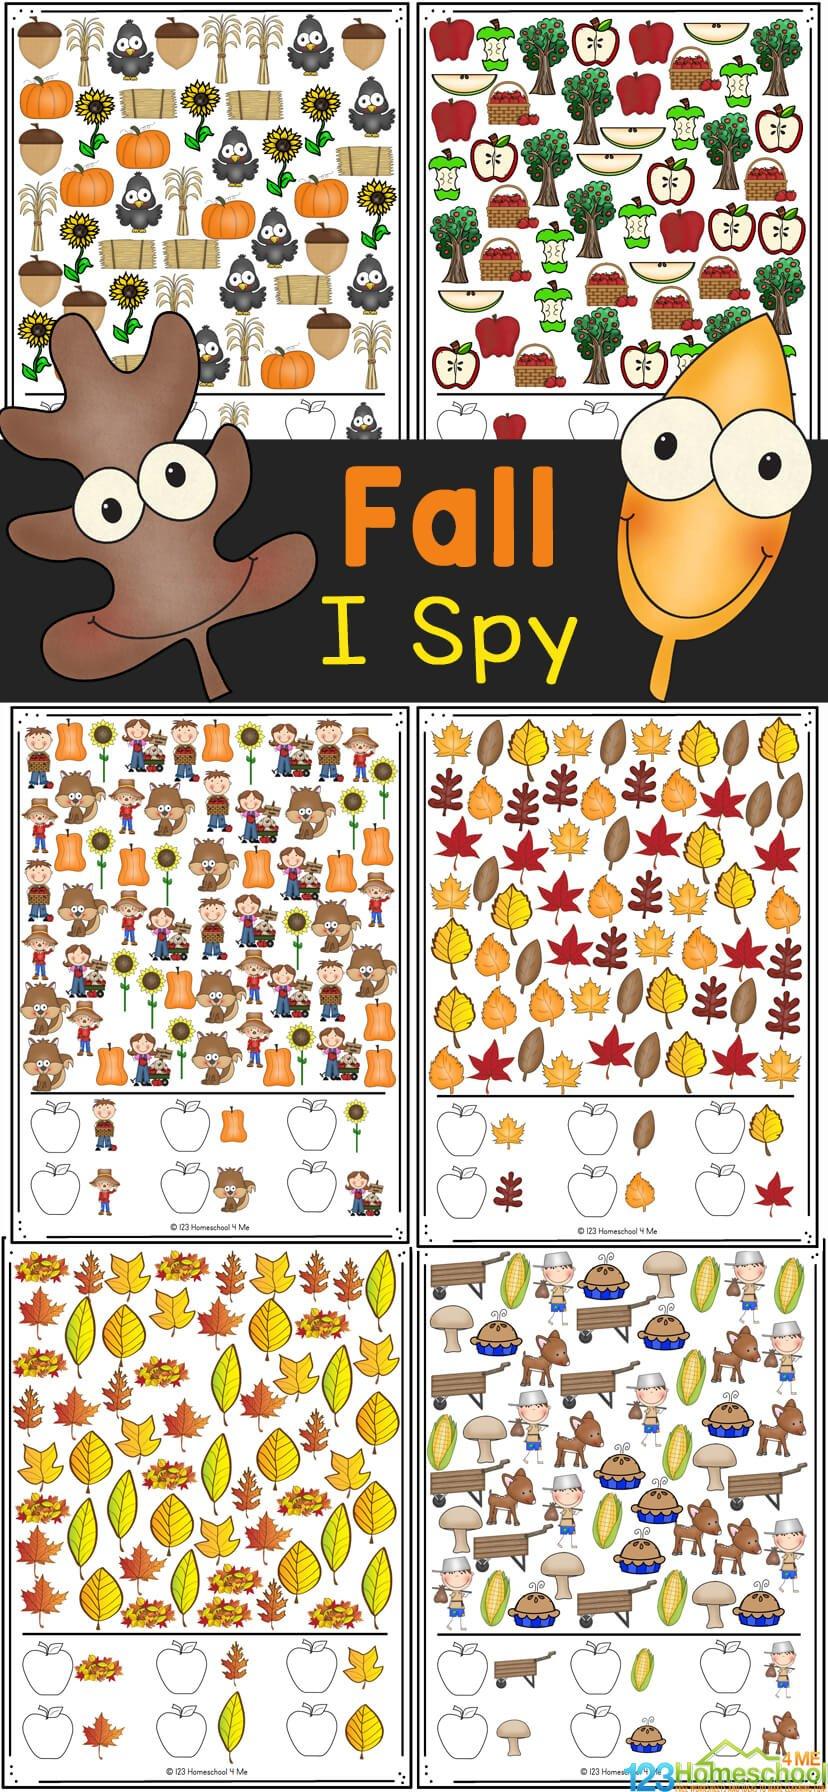 Fall I Spy Worksheets 123 Homeschool 4 Me